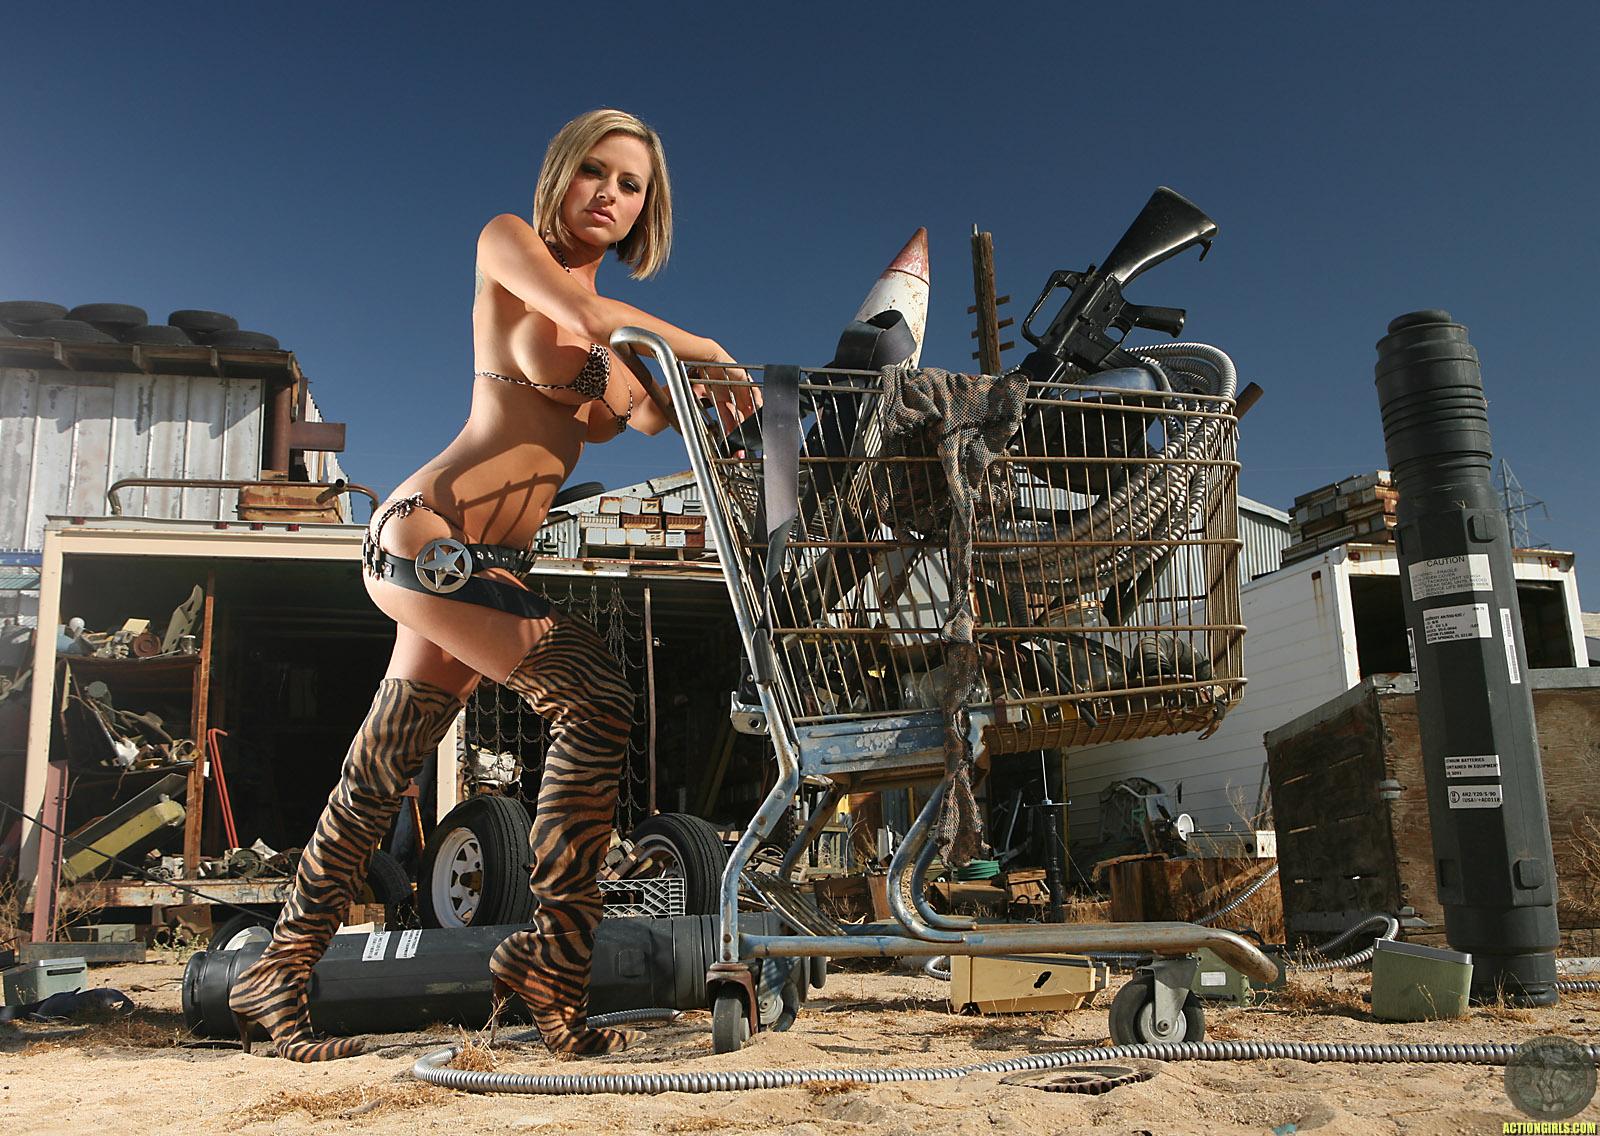 Download picture xxxx toone walpaper women zombie xxx pics